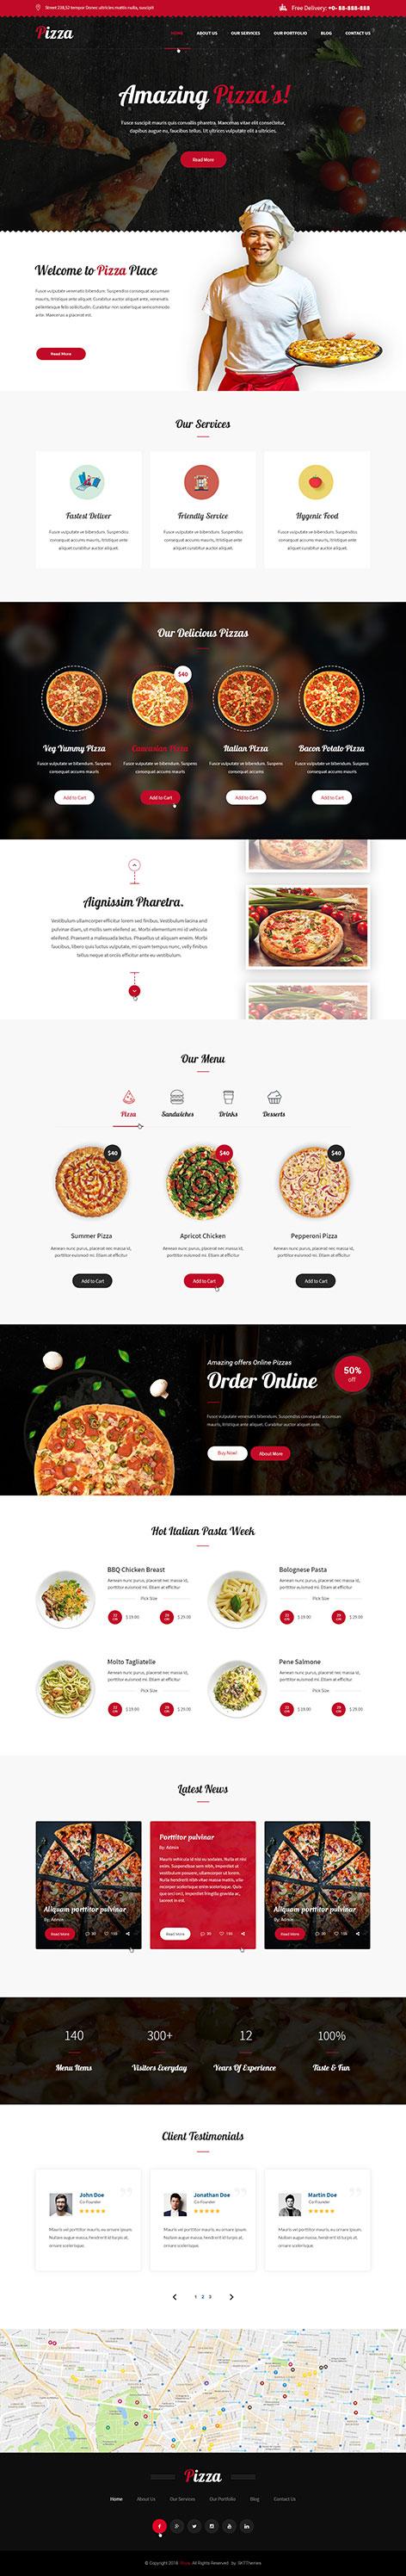 pizza ordering WordPress theme